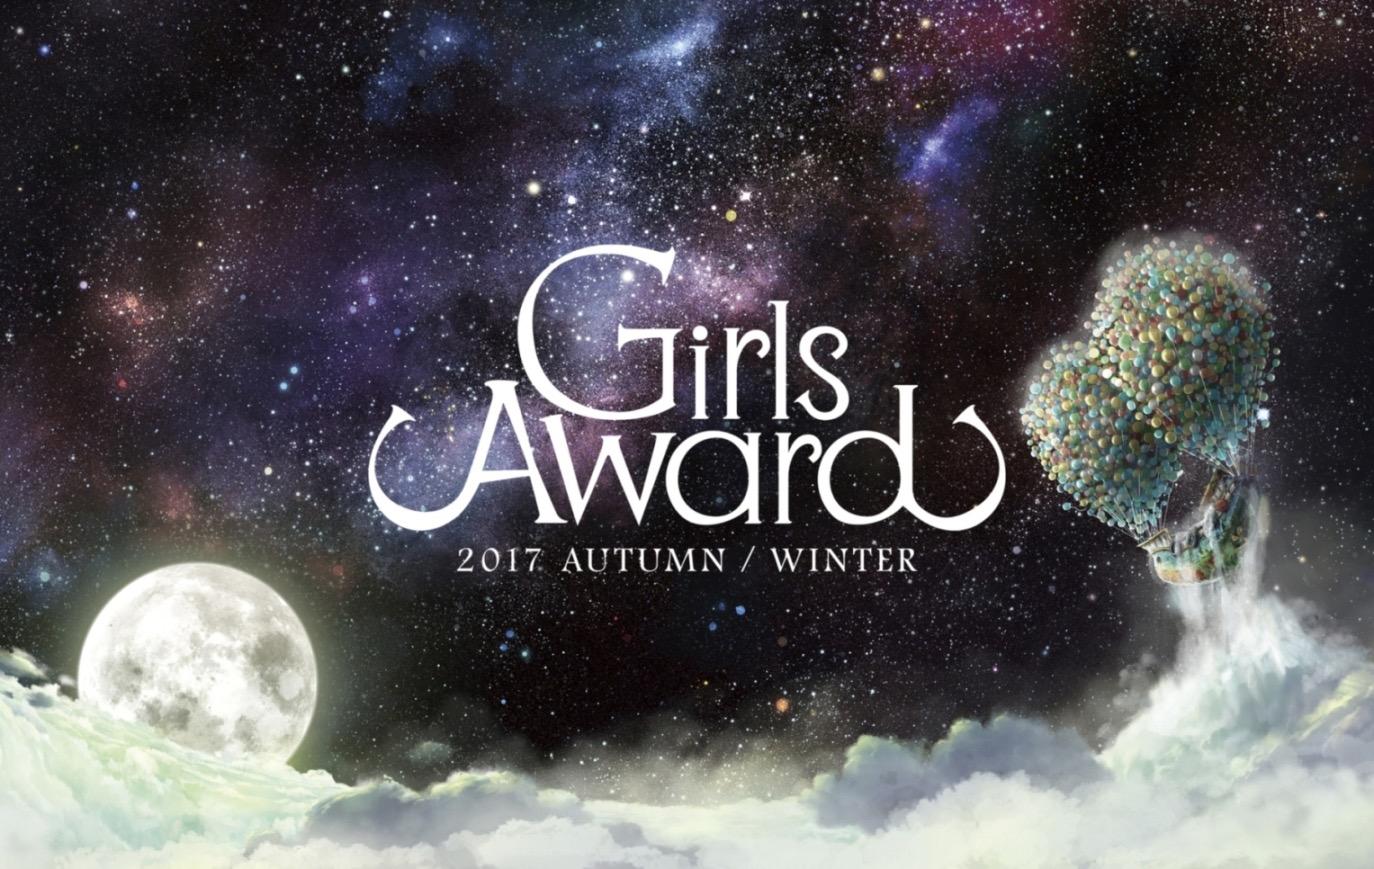 「GirlsAward2017 AUTUMN/WINTER」メインアート(作・西野亮廣)